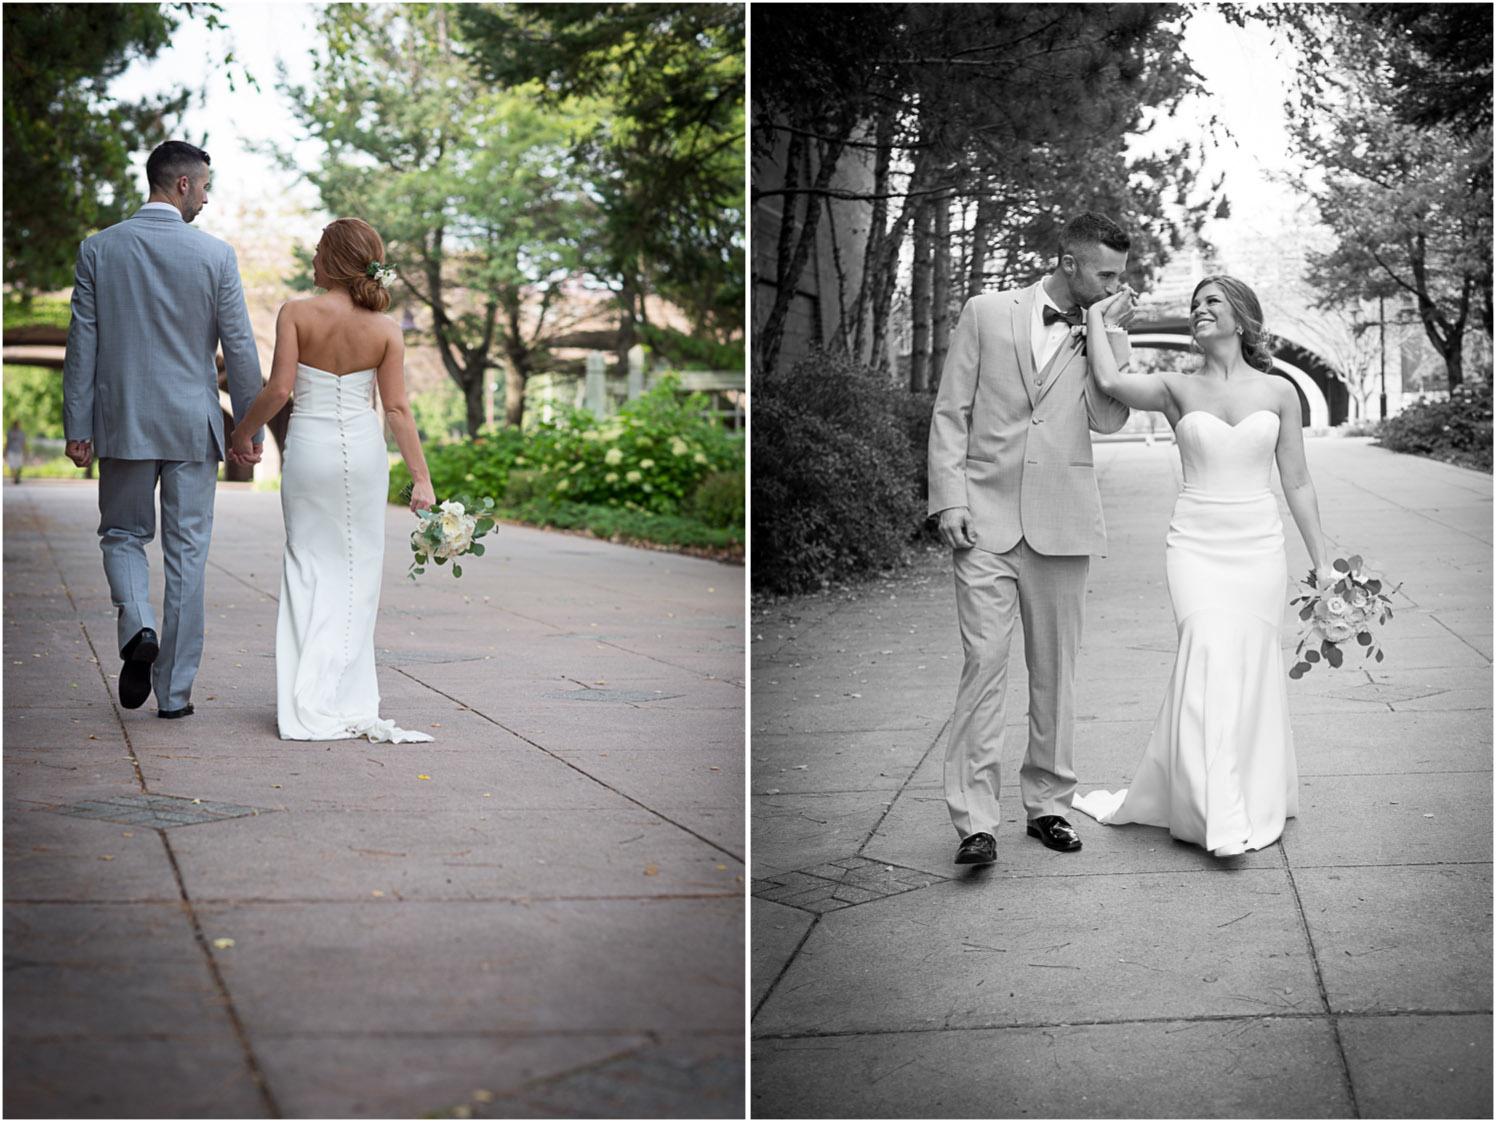 22-bride-groom-fun-casual-portraits-trees-centannial-lakes-minneapolis-minnesota-mahonen-photography.jpg